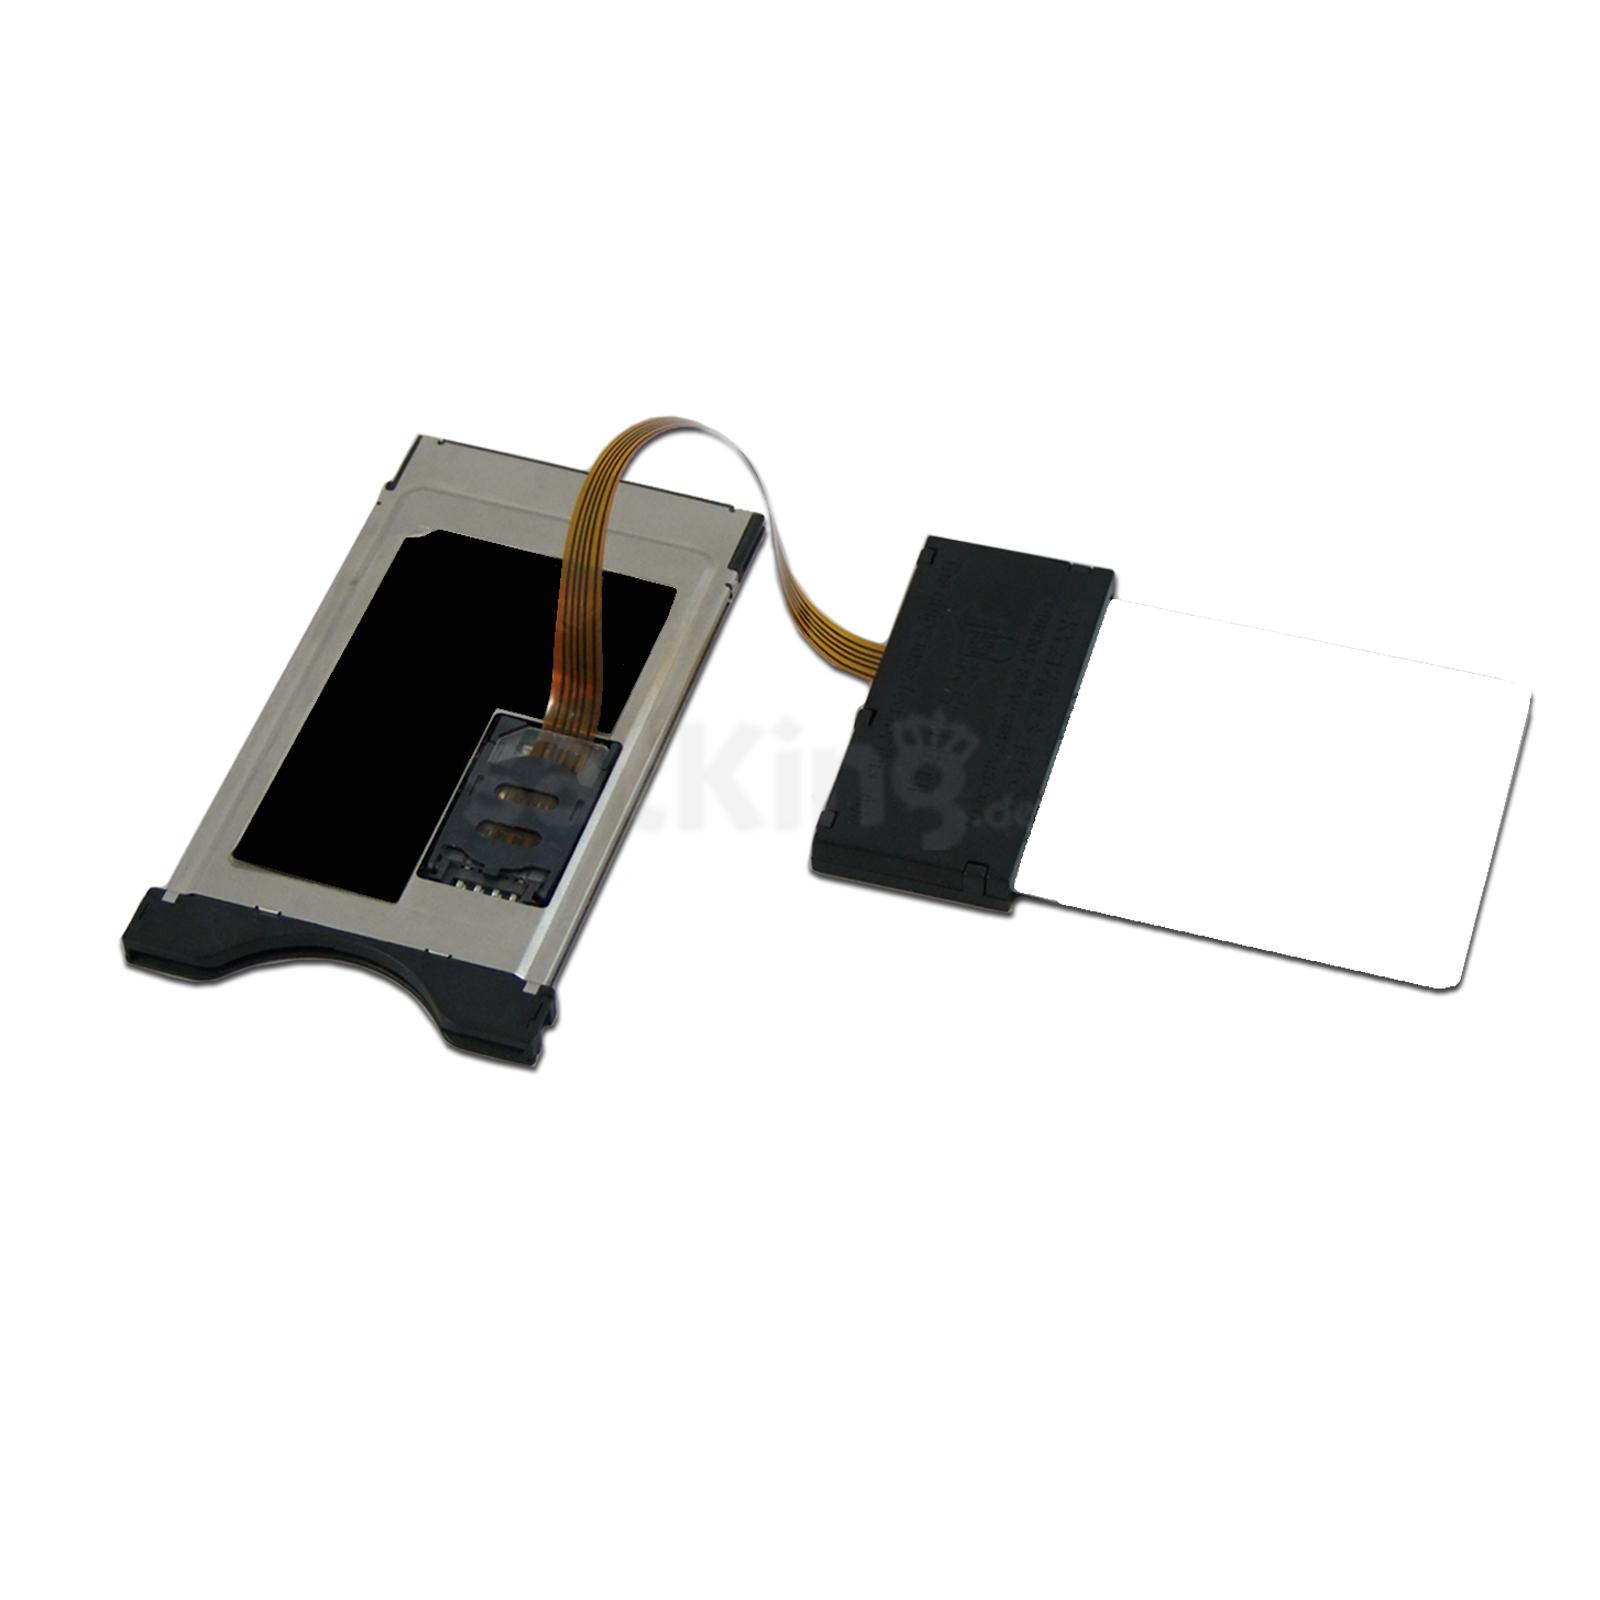 maxcam ci deltacam ci twin modul sim card adapter auf. Black Bedroom Furniture Sets. Home Design Ideas